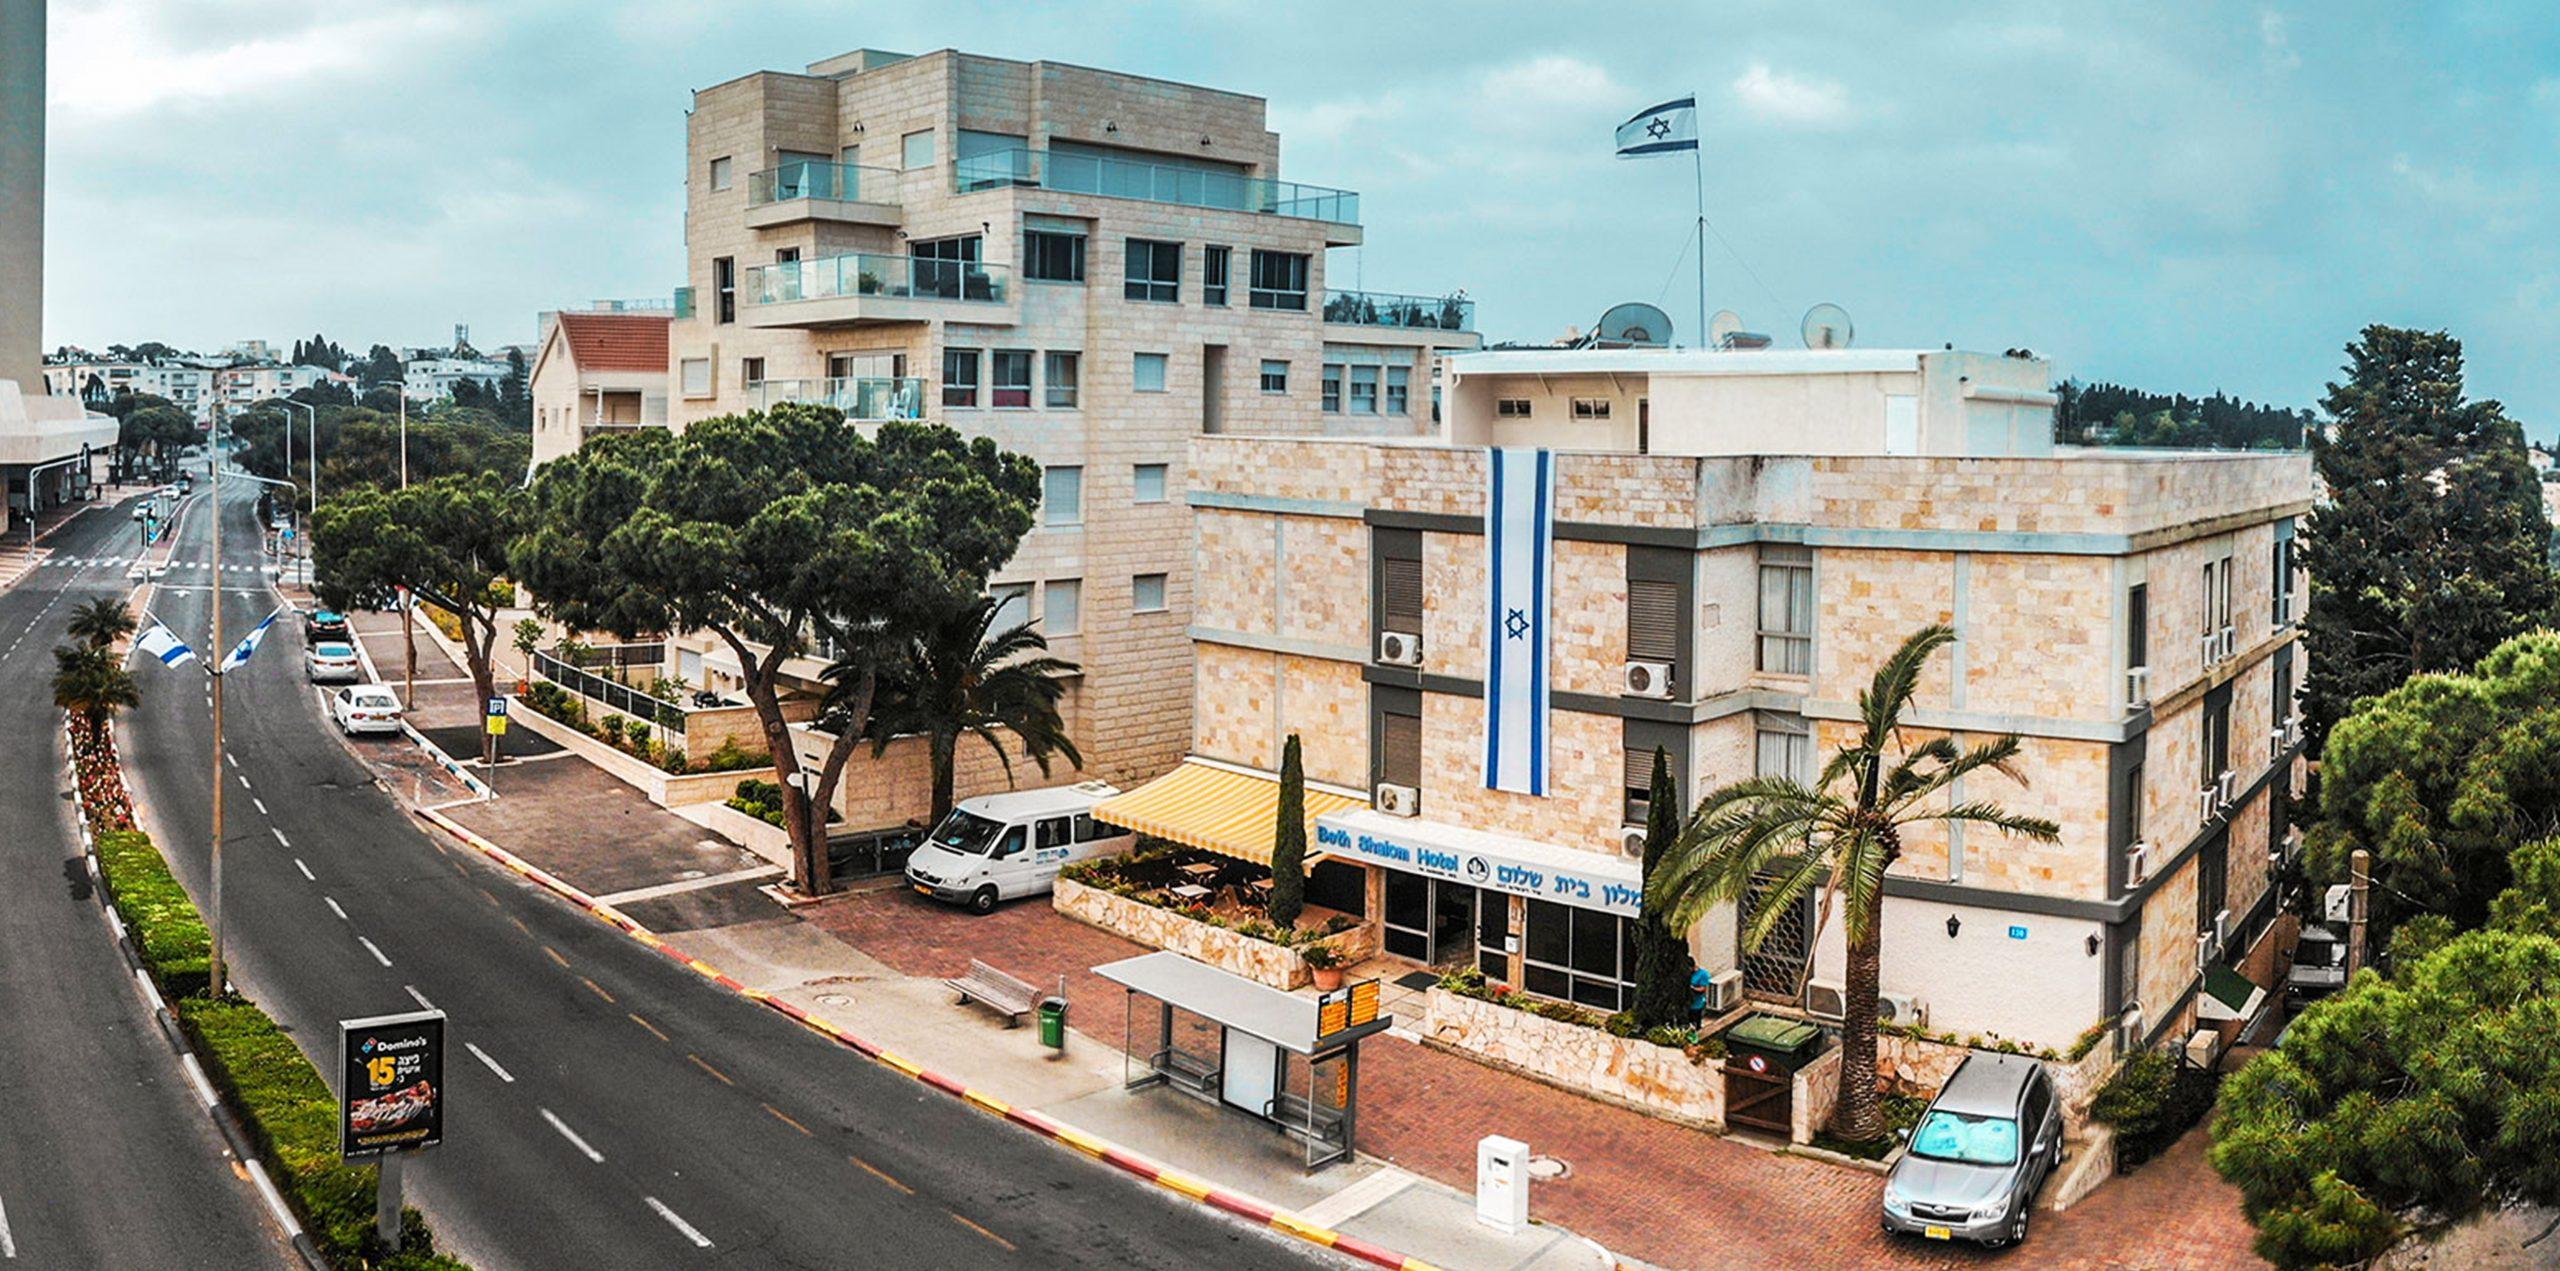 Peaceful Refuge in the center of Haifa